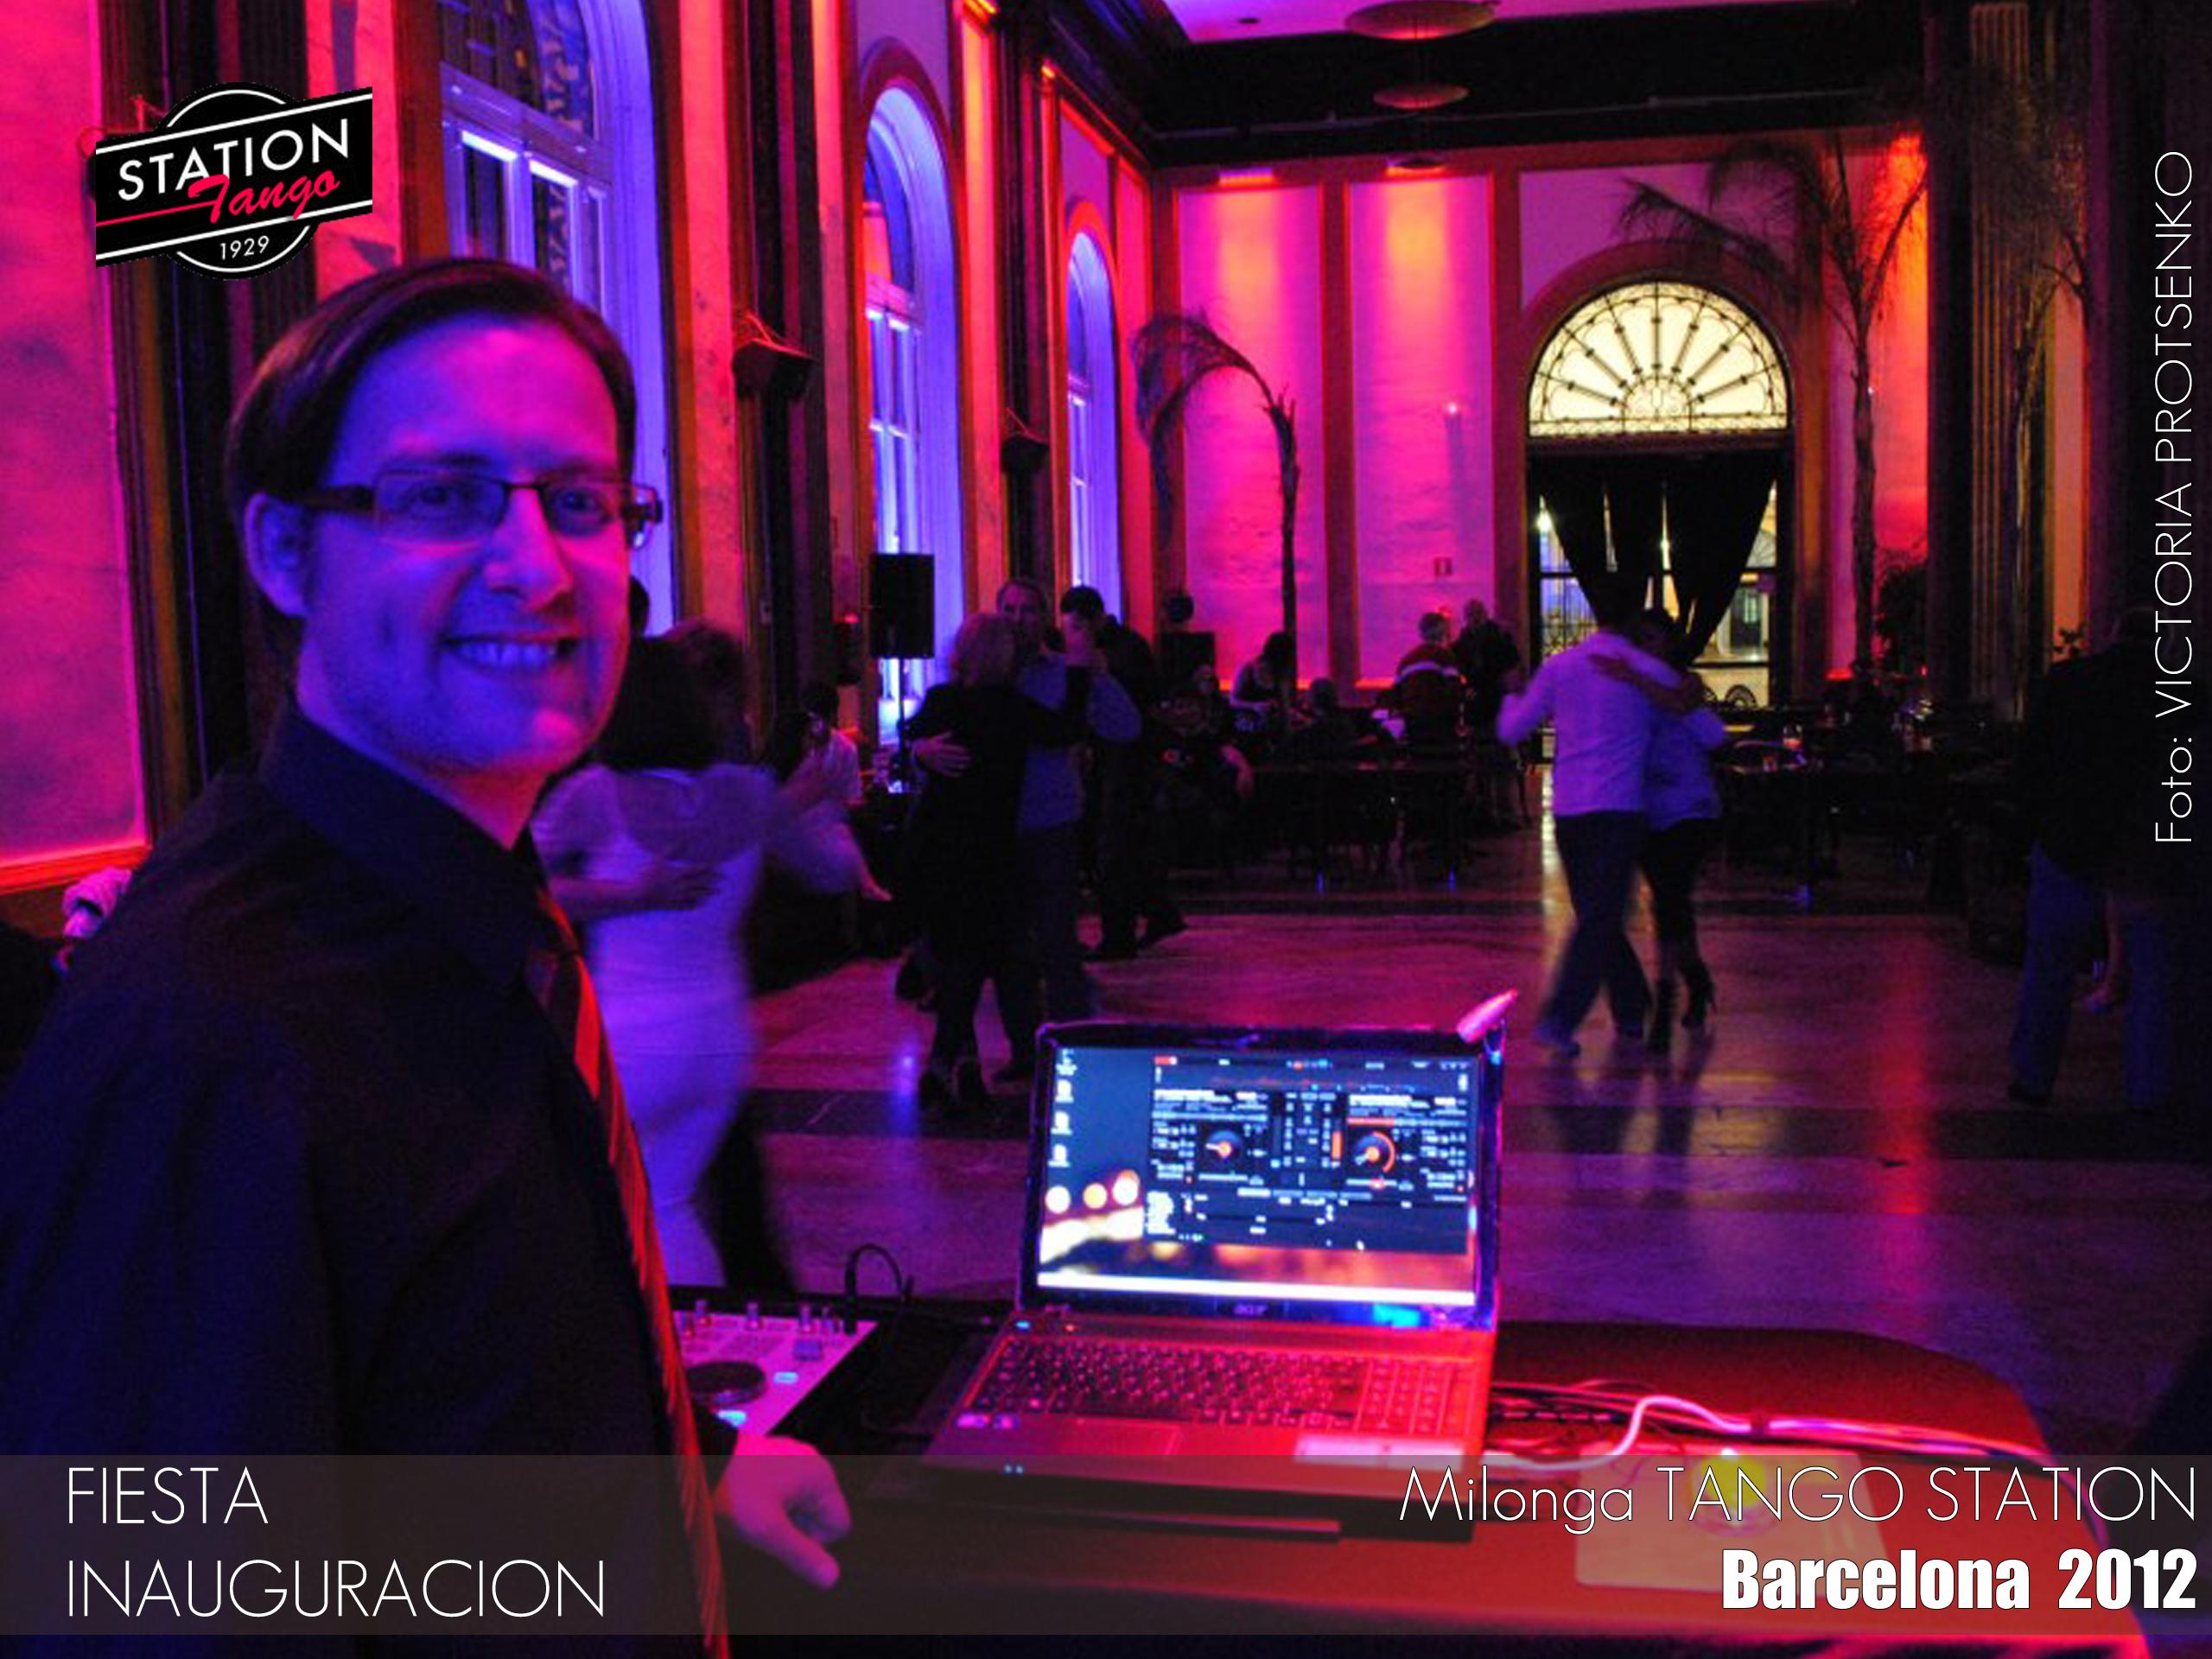 Milonga+Tango+Station+Barcelona+2012+02